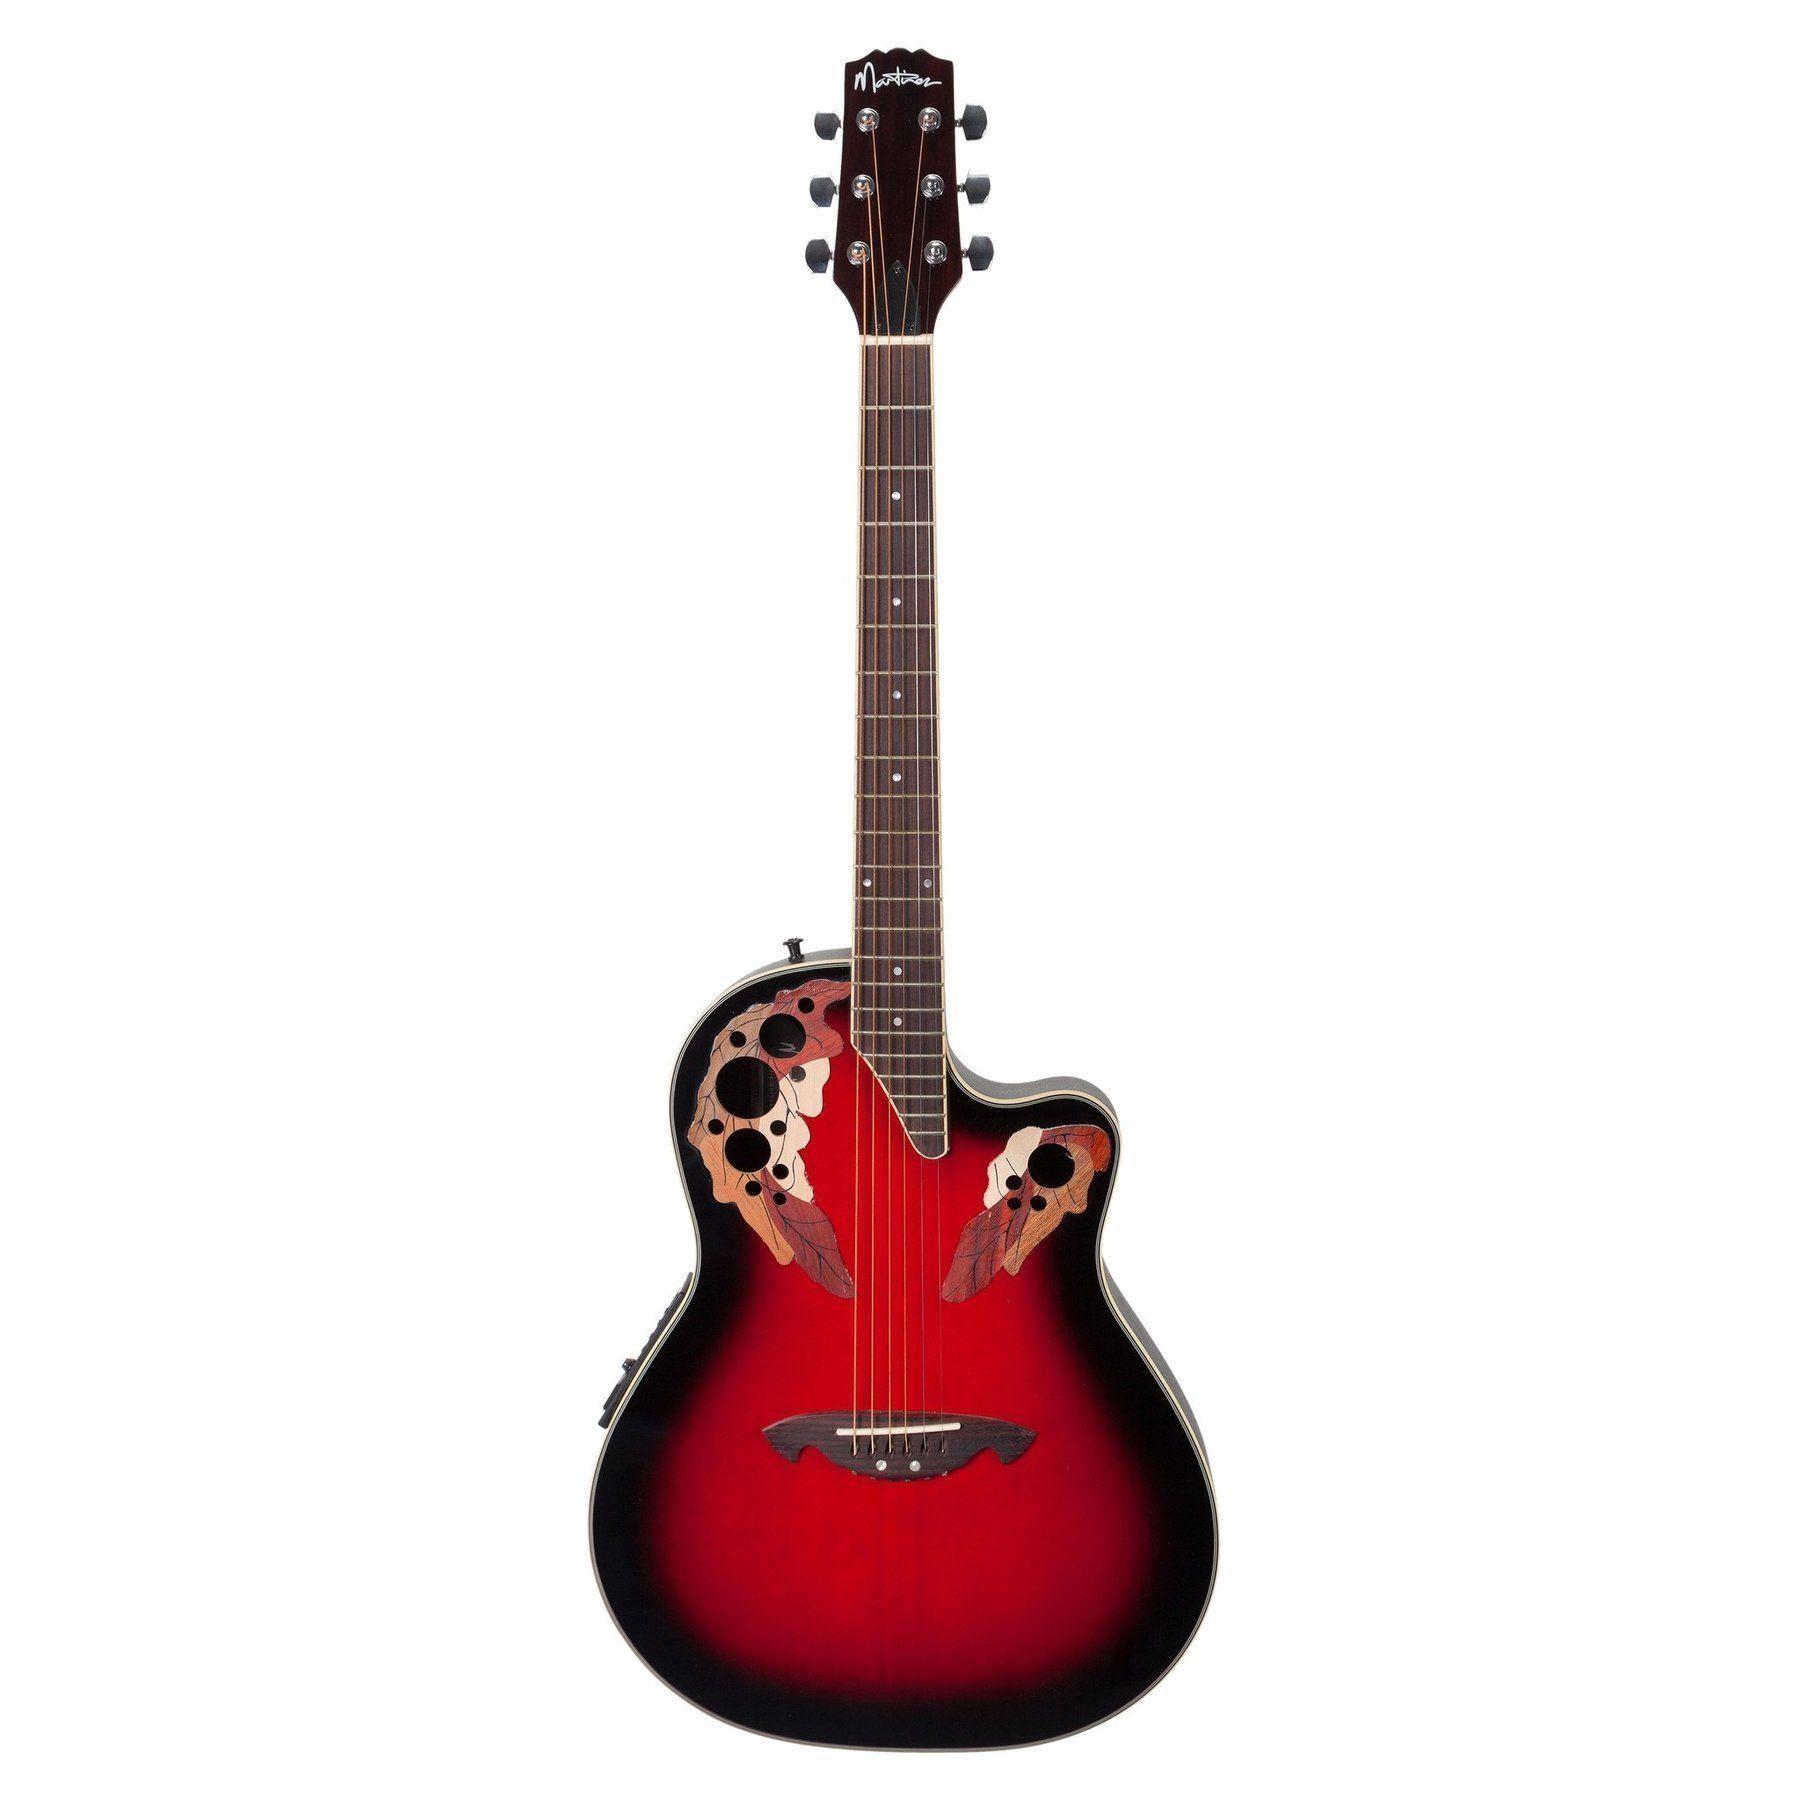 Martinez Acoustic Electric Roundback Cutaway Guitar Transparent Wine Red Acoustic Electric